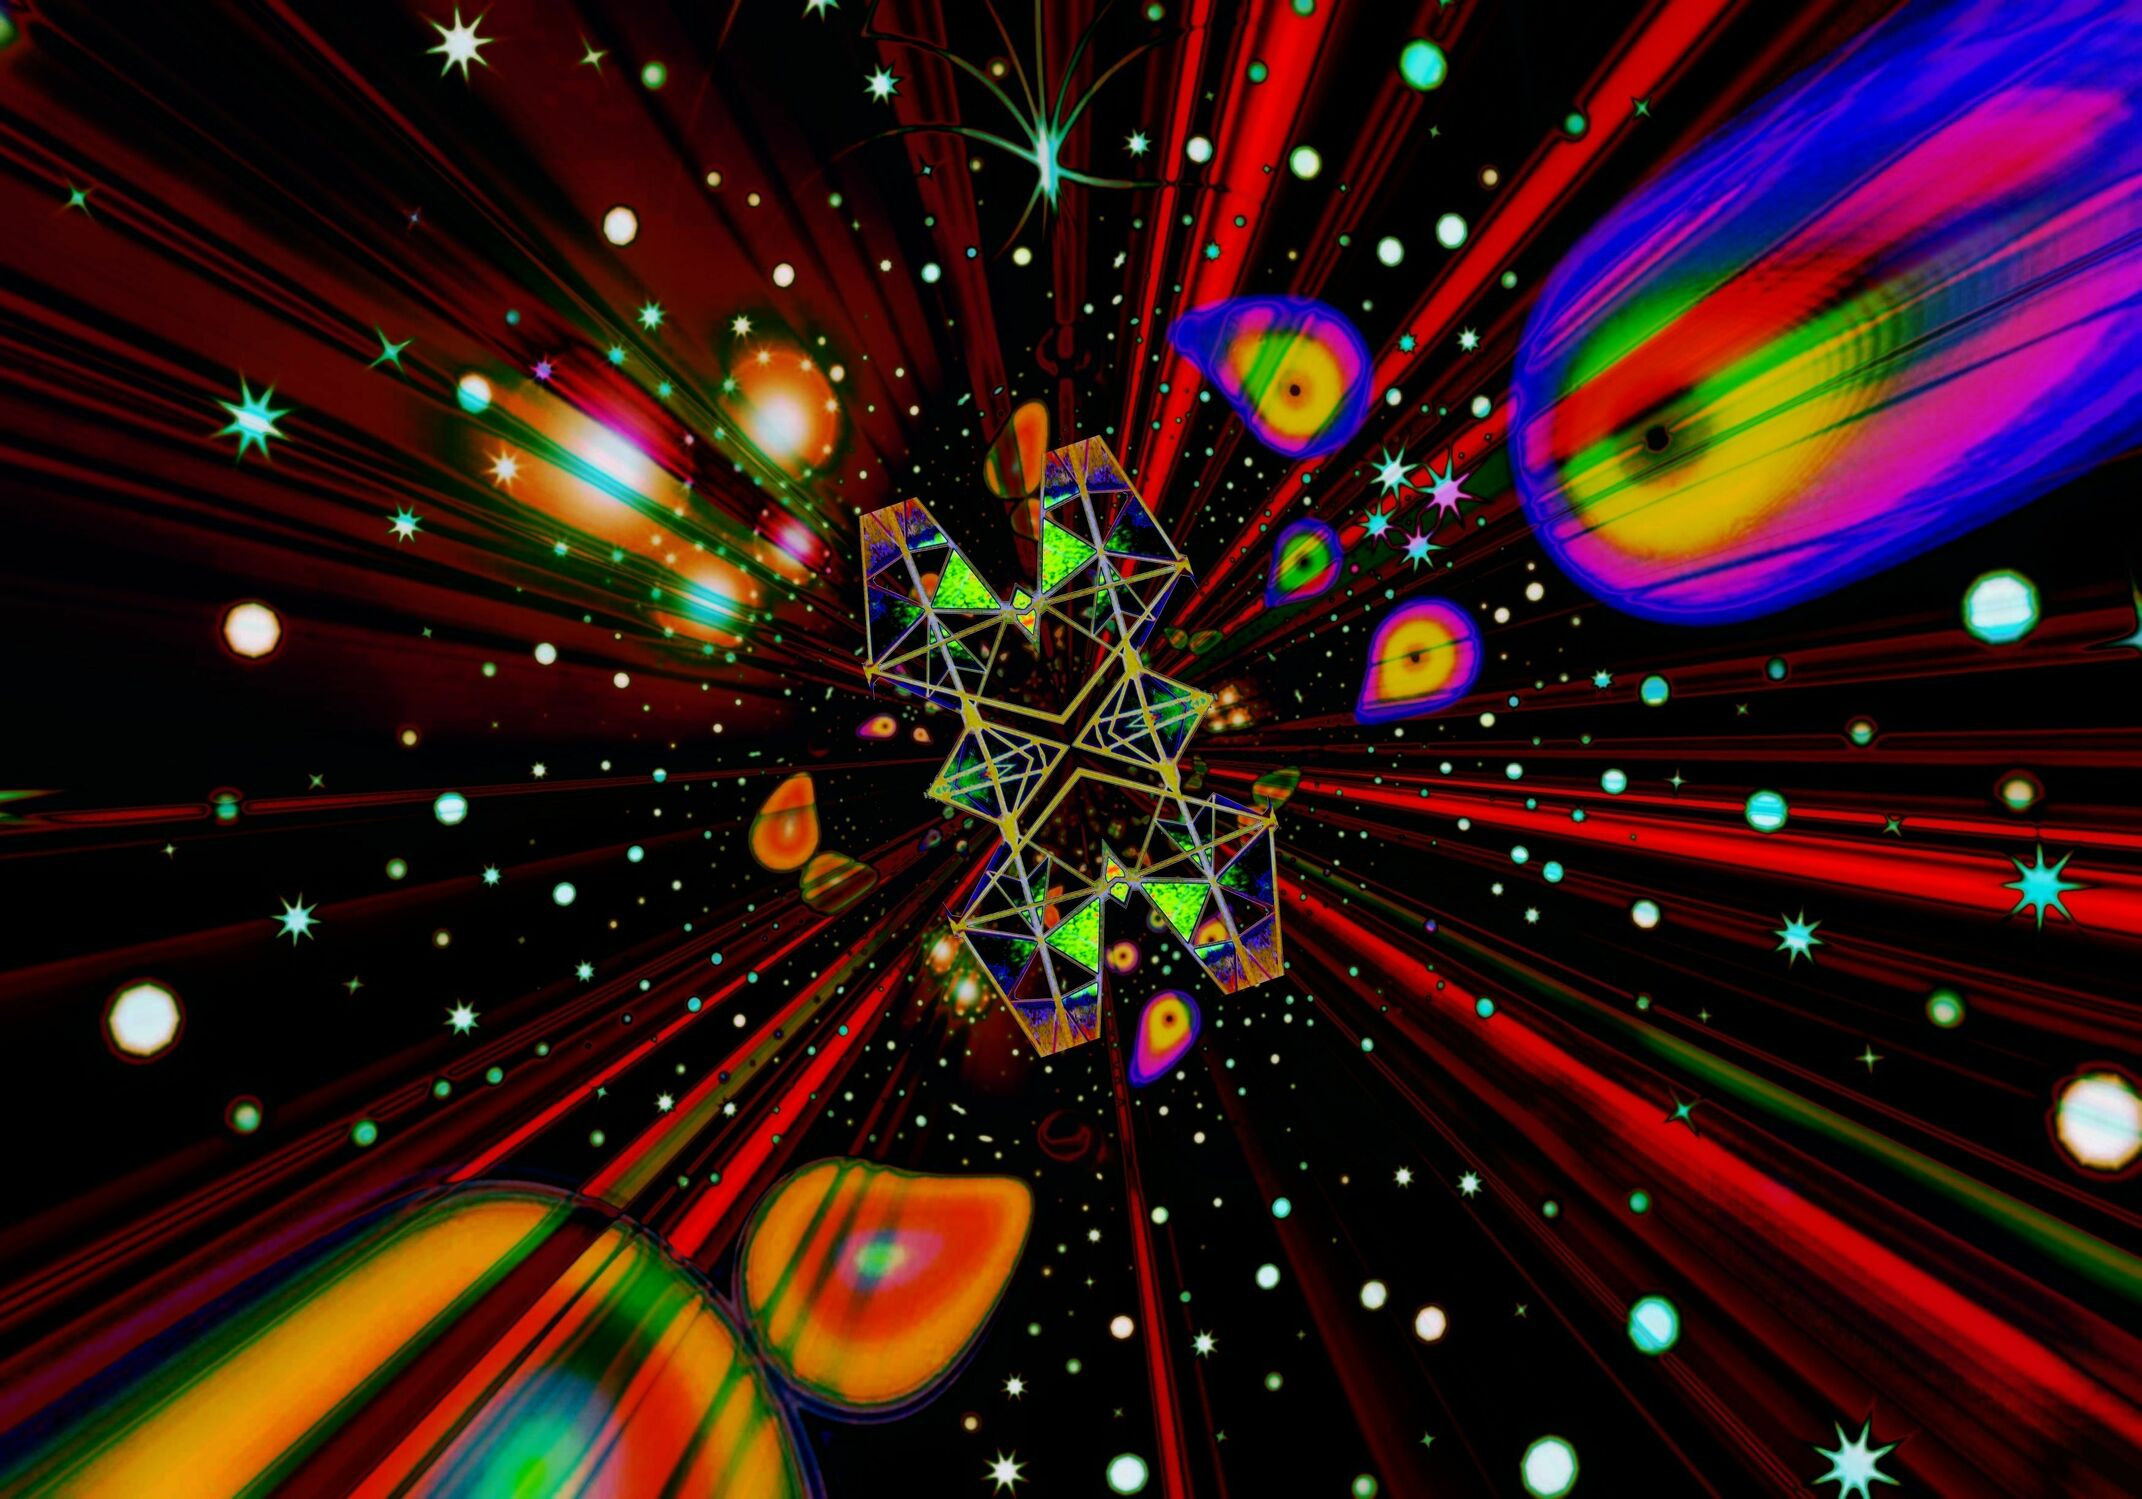 Bild mit Universum